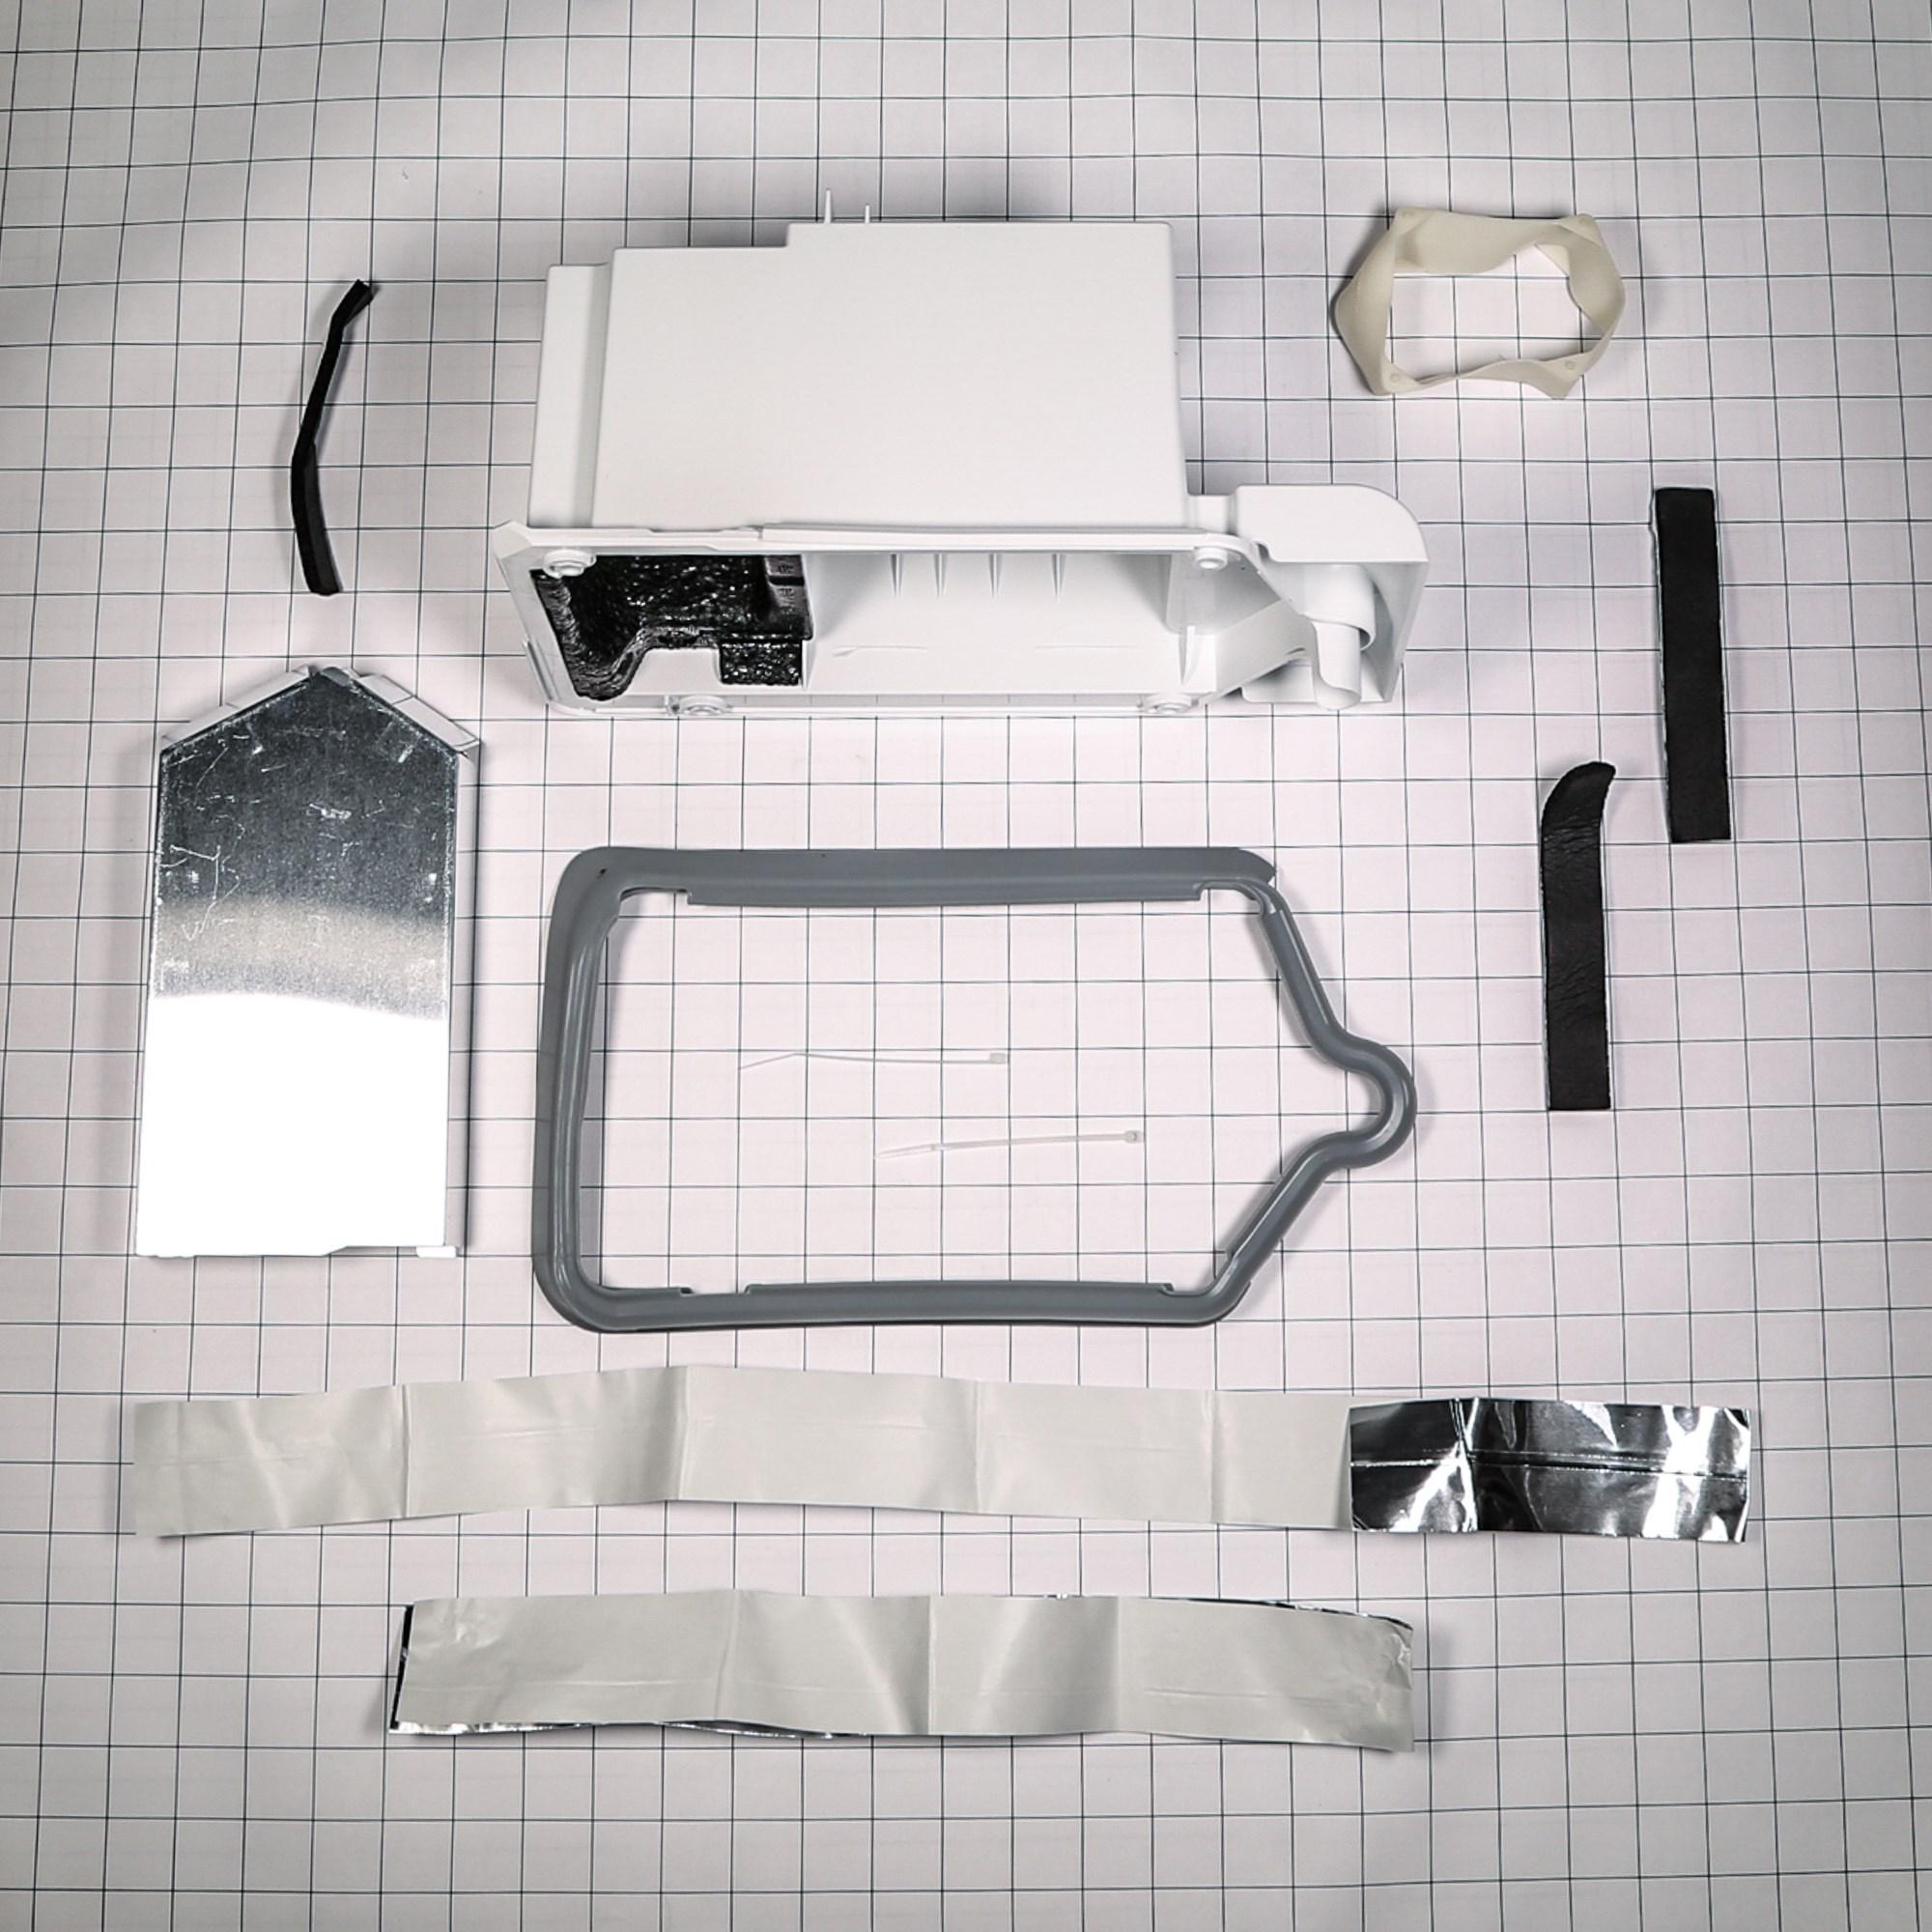 Genuine Frigidaire 5303918784 Refrigerator Ice Maker Housing and Gasket Kit